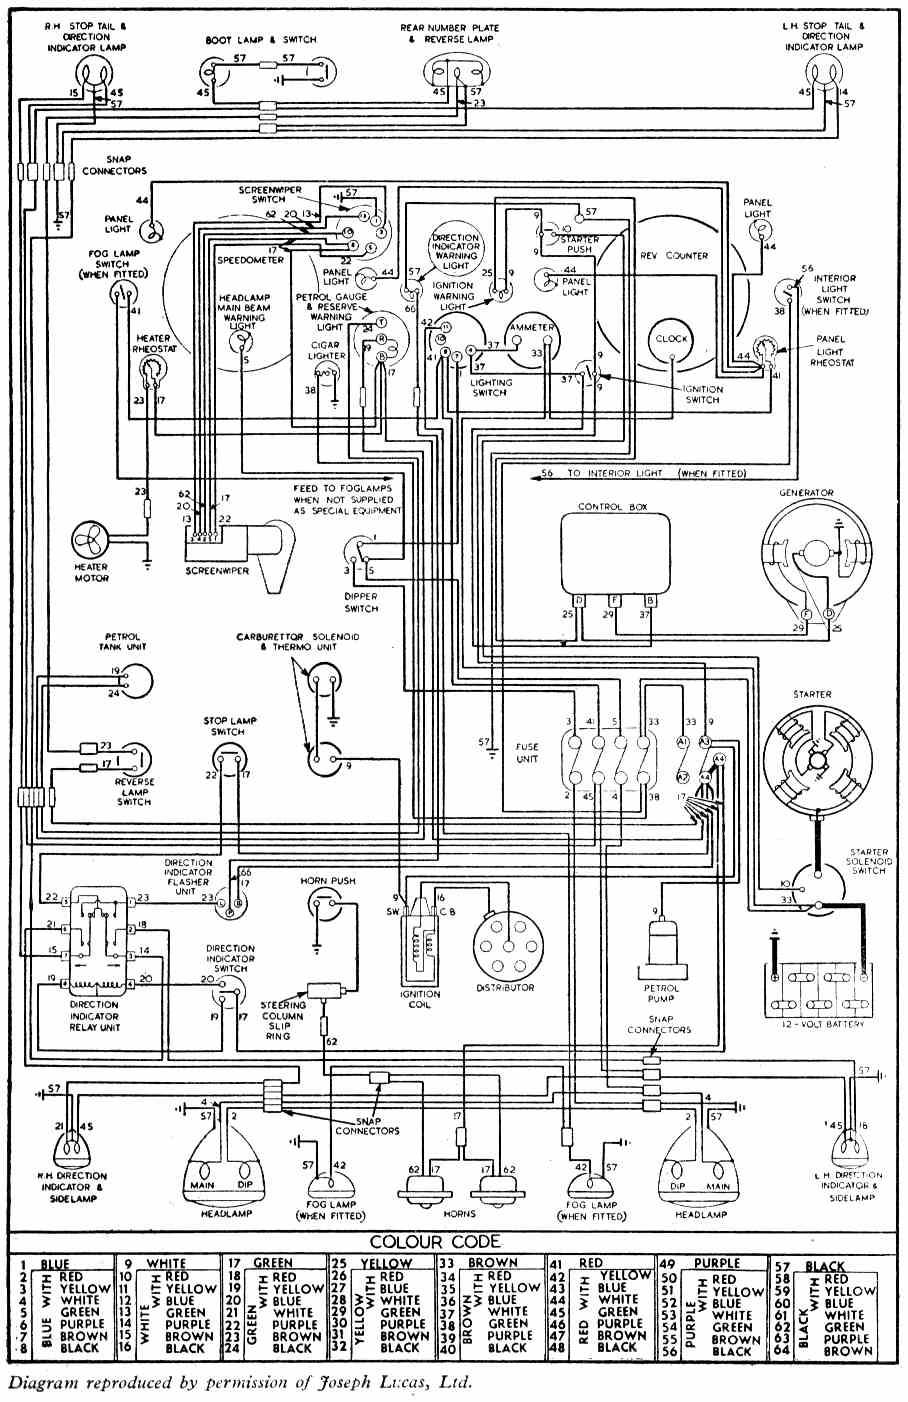 xk120 wiring diagram best wiring library Mgb Wiring Diagram wiring diagrams jaguar xk120 wiring diagram libraries jaguar speaker wiring diagrams 1954 jaguar xk120 wiring diagram